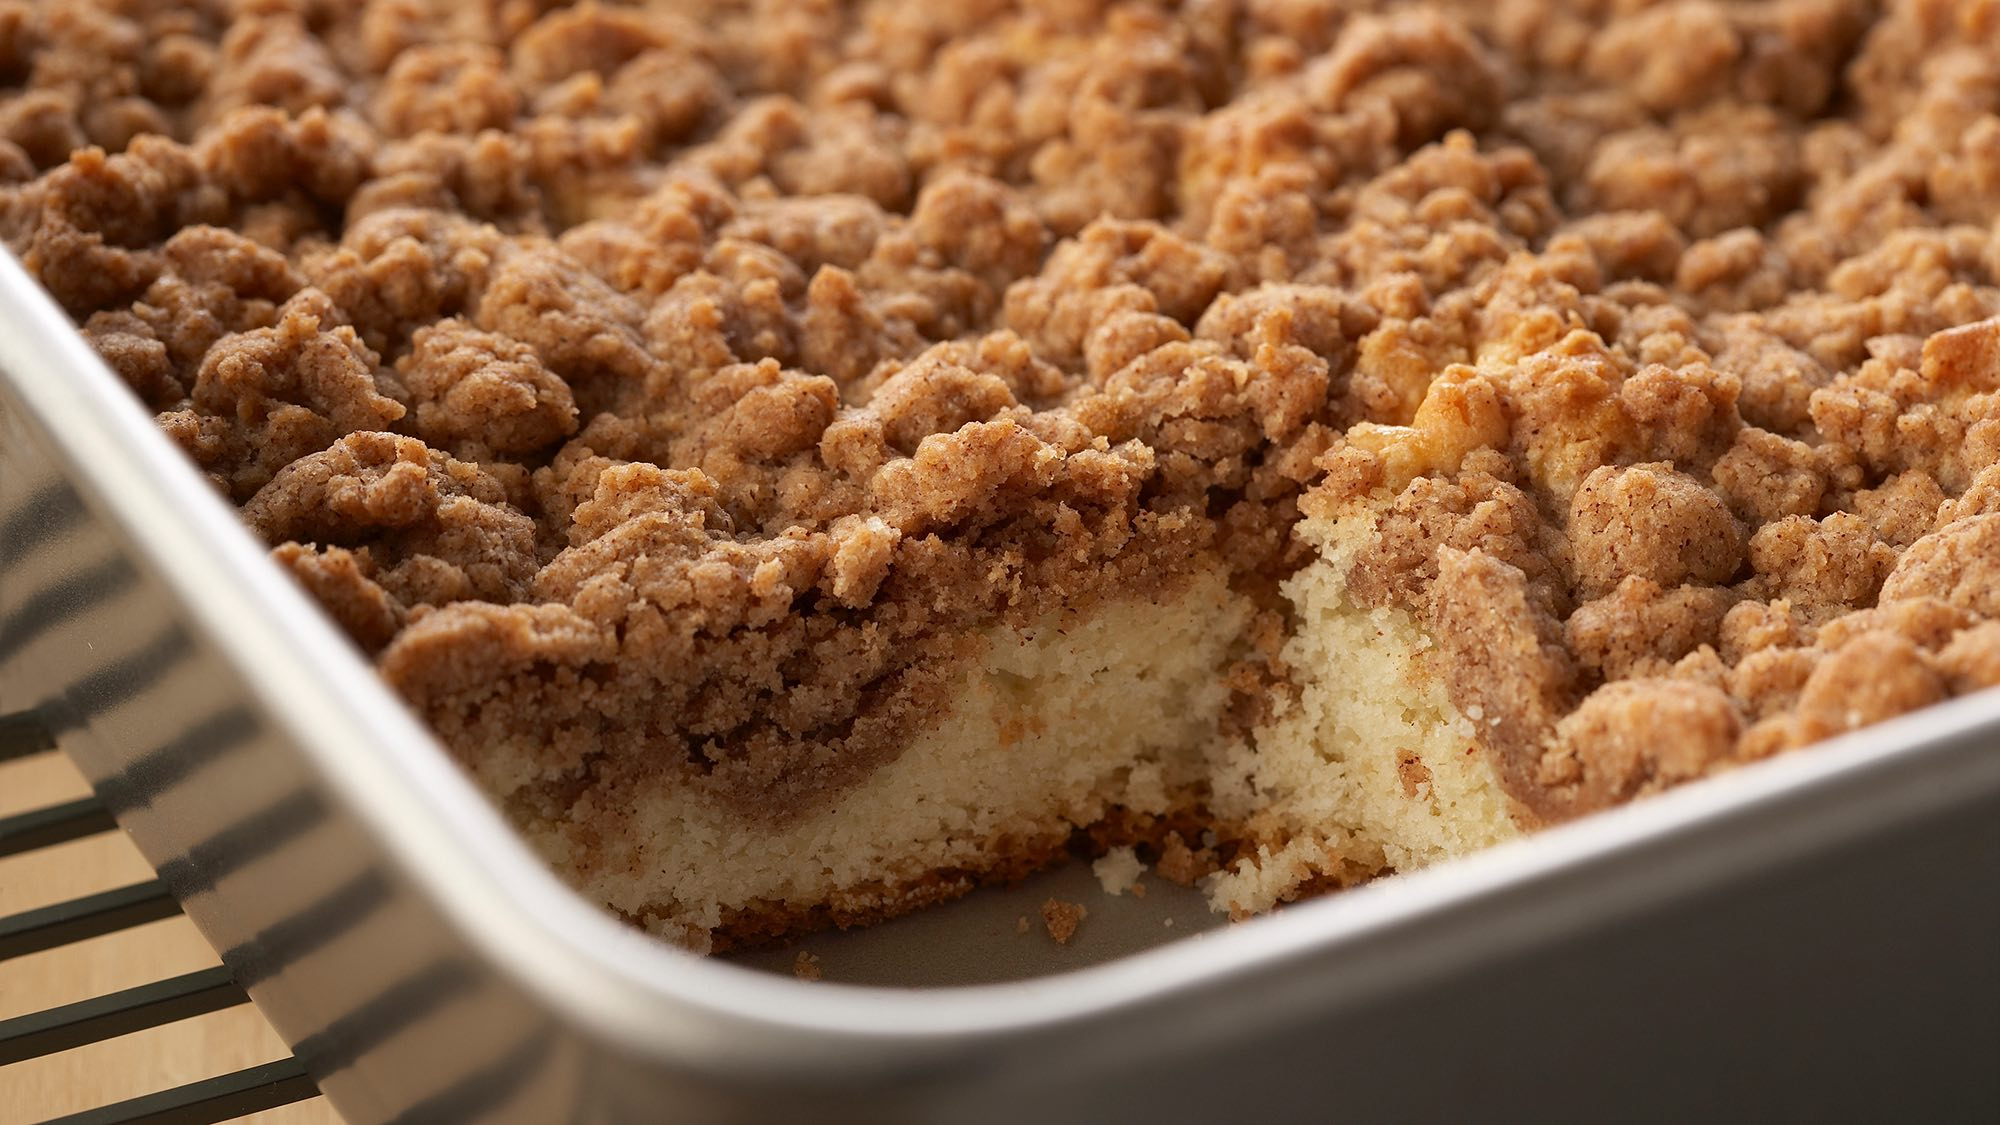 McCormick Cinnamon Crumb Cake